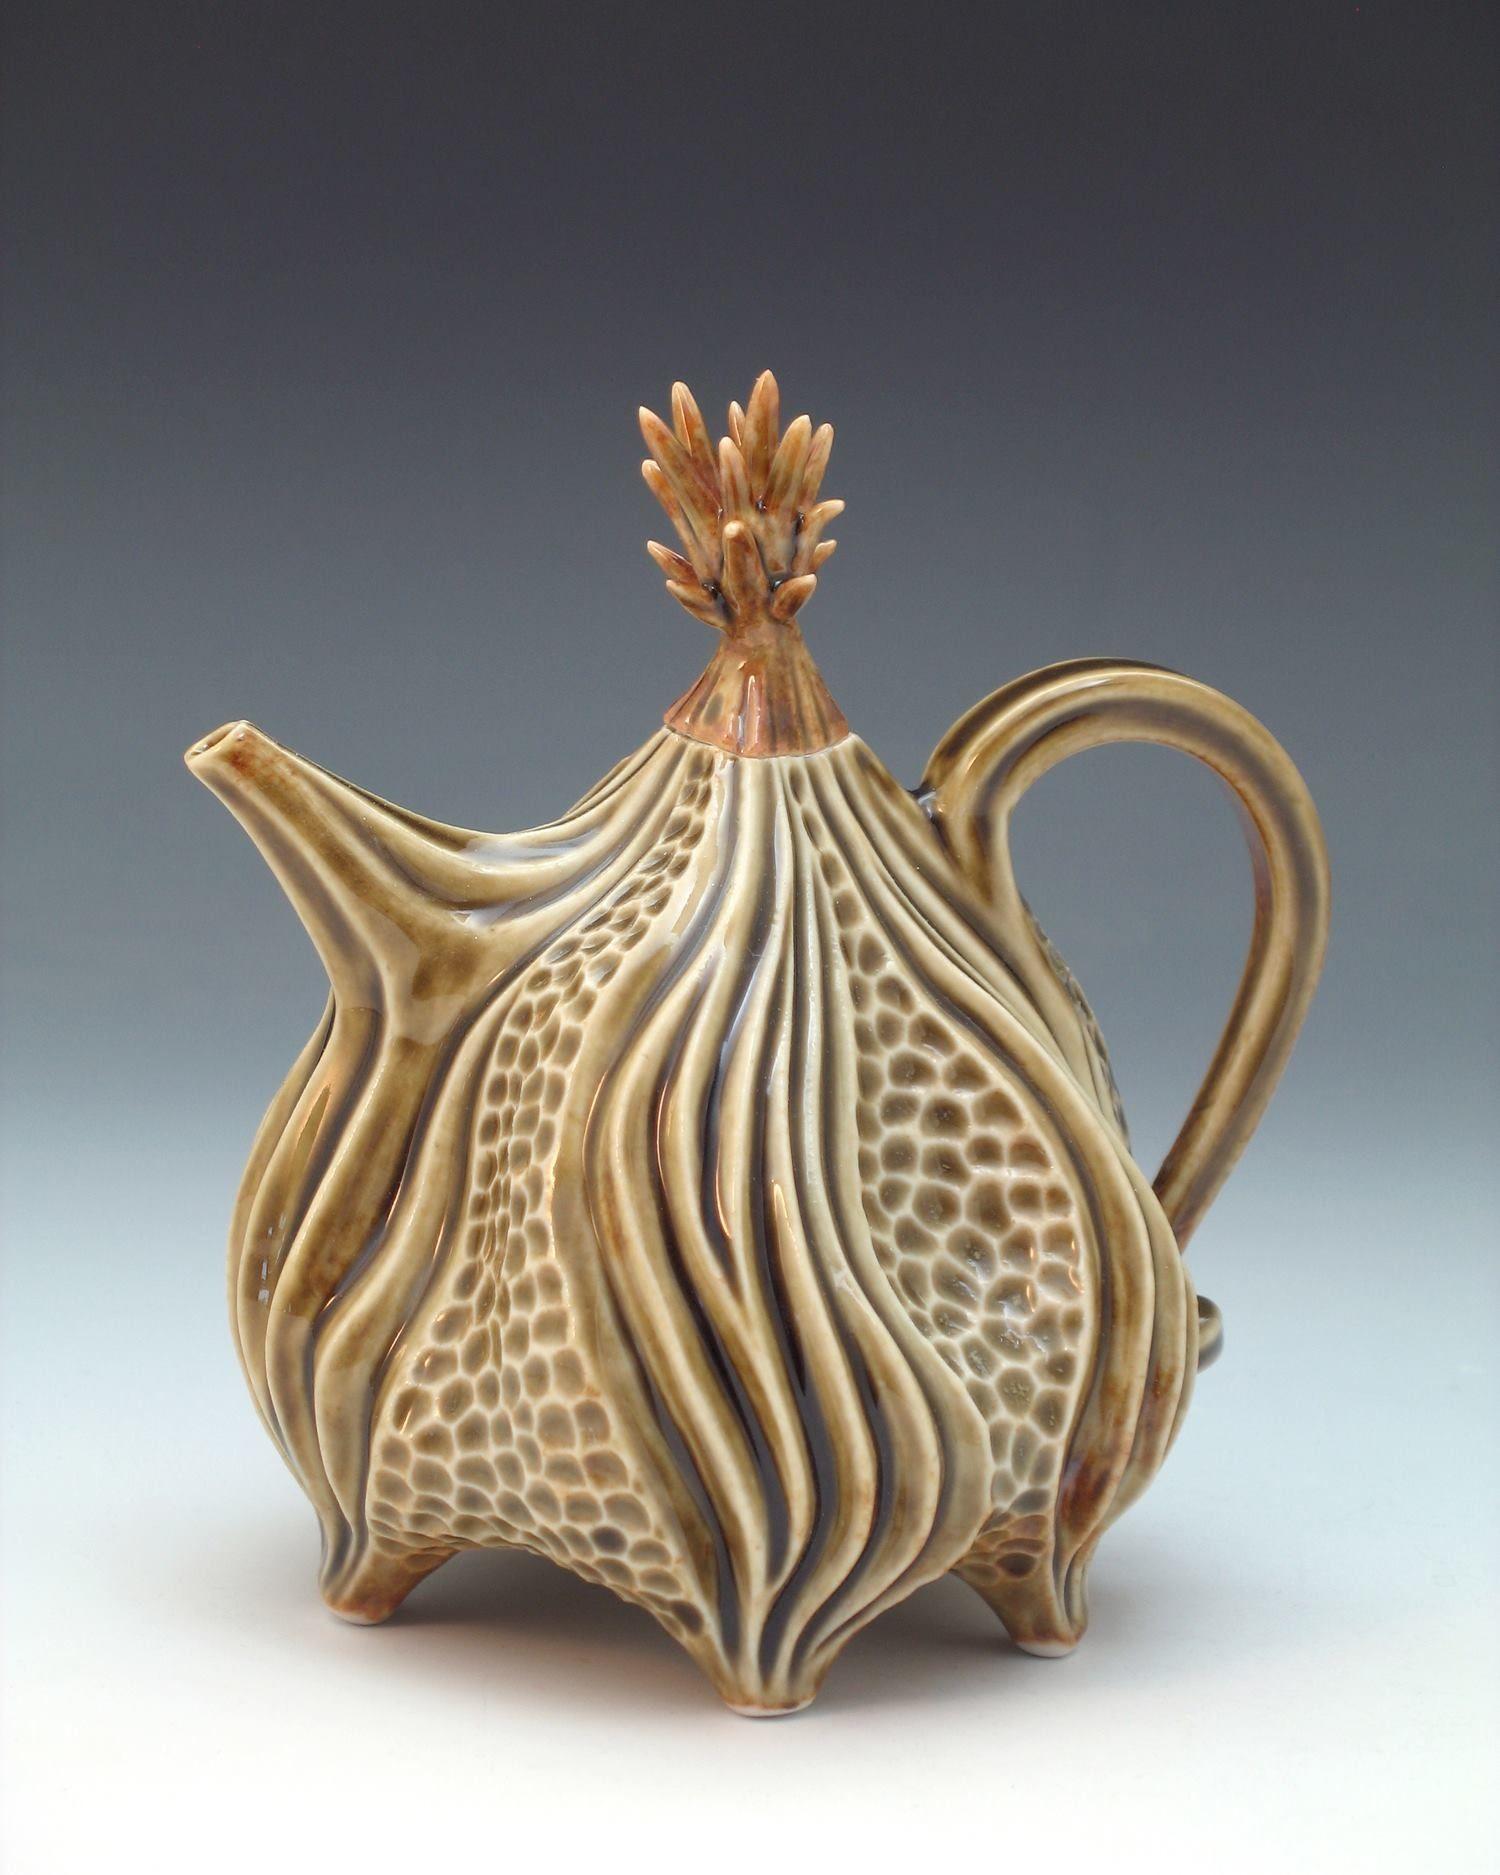 Sweet teapot